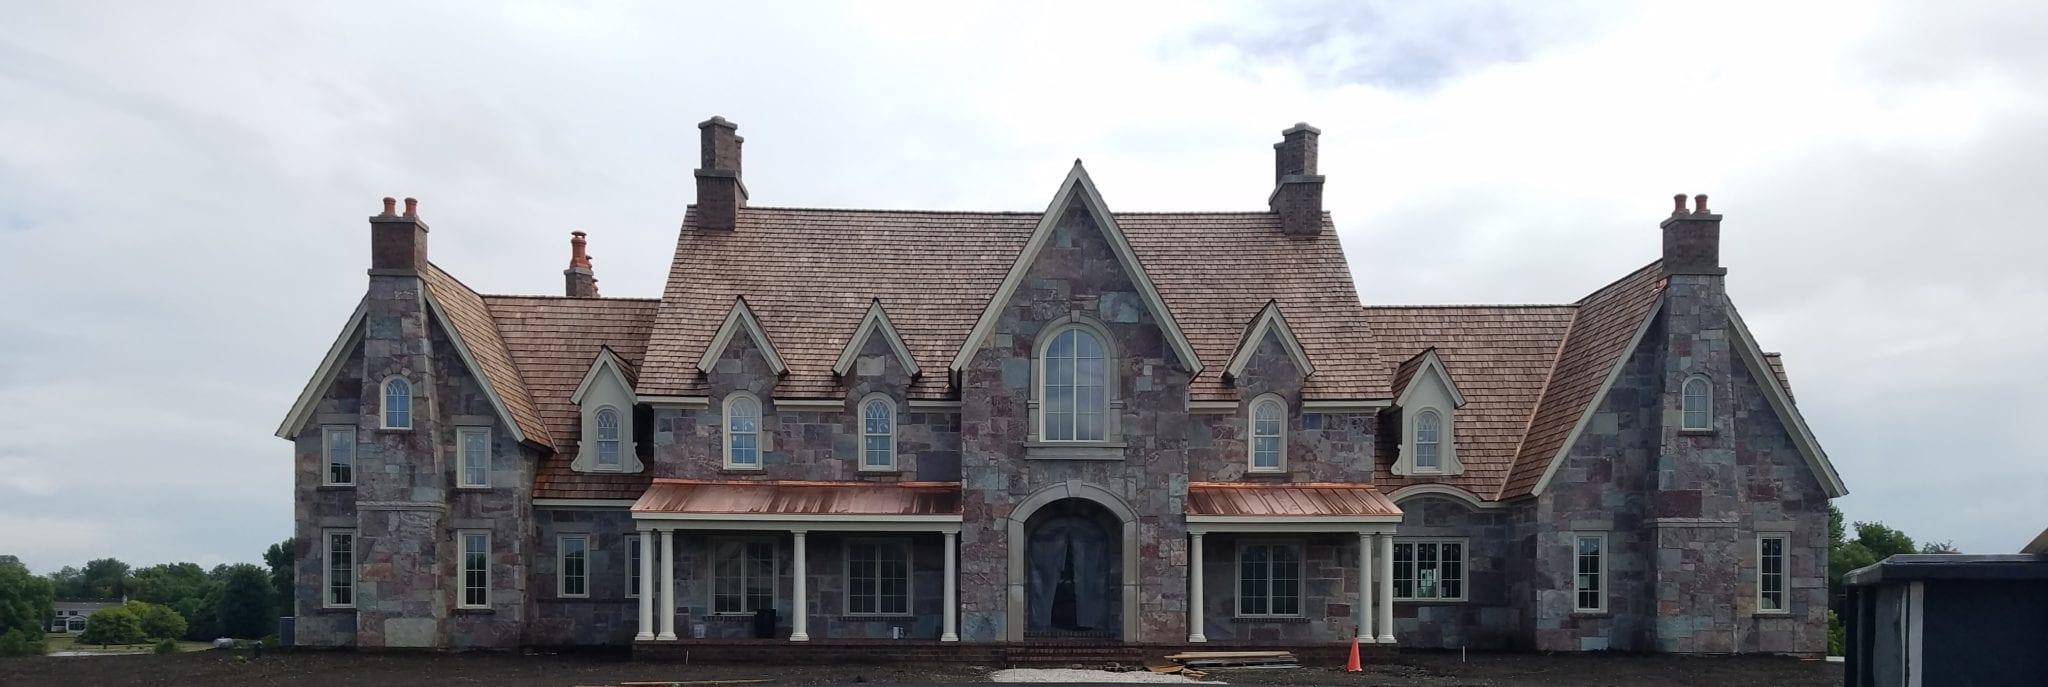 Ambrose Real Thin Stone Veneer Home Exterior